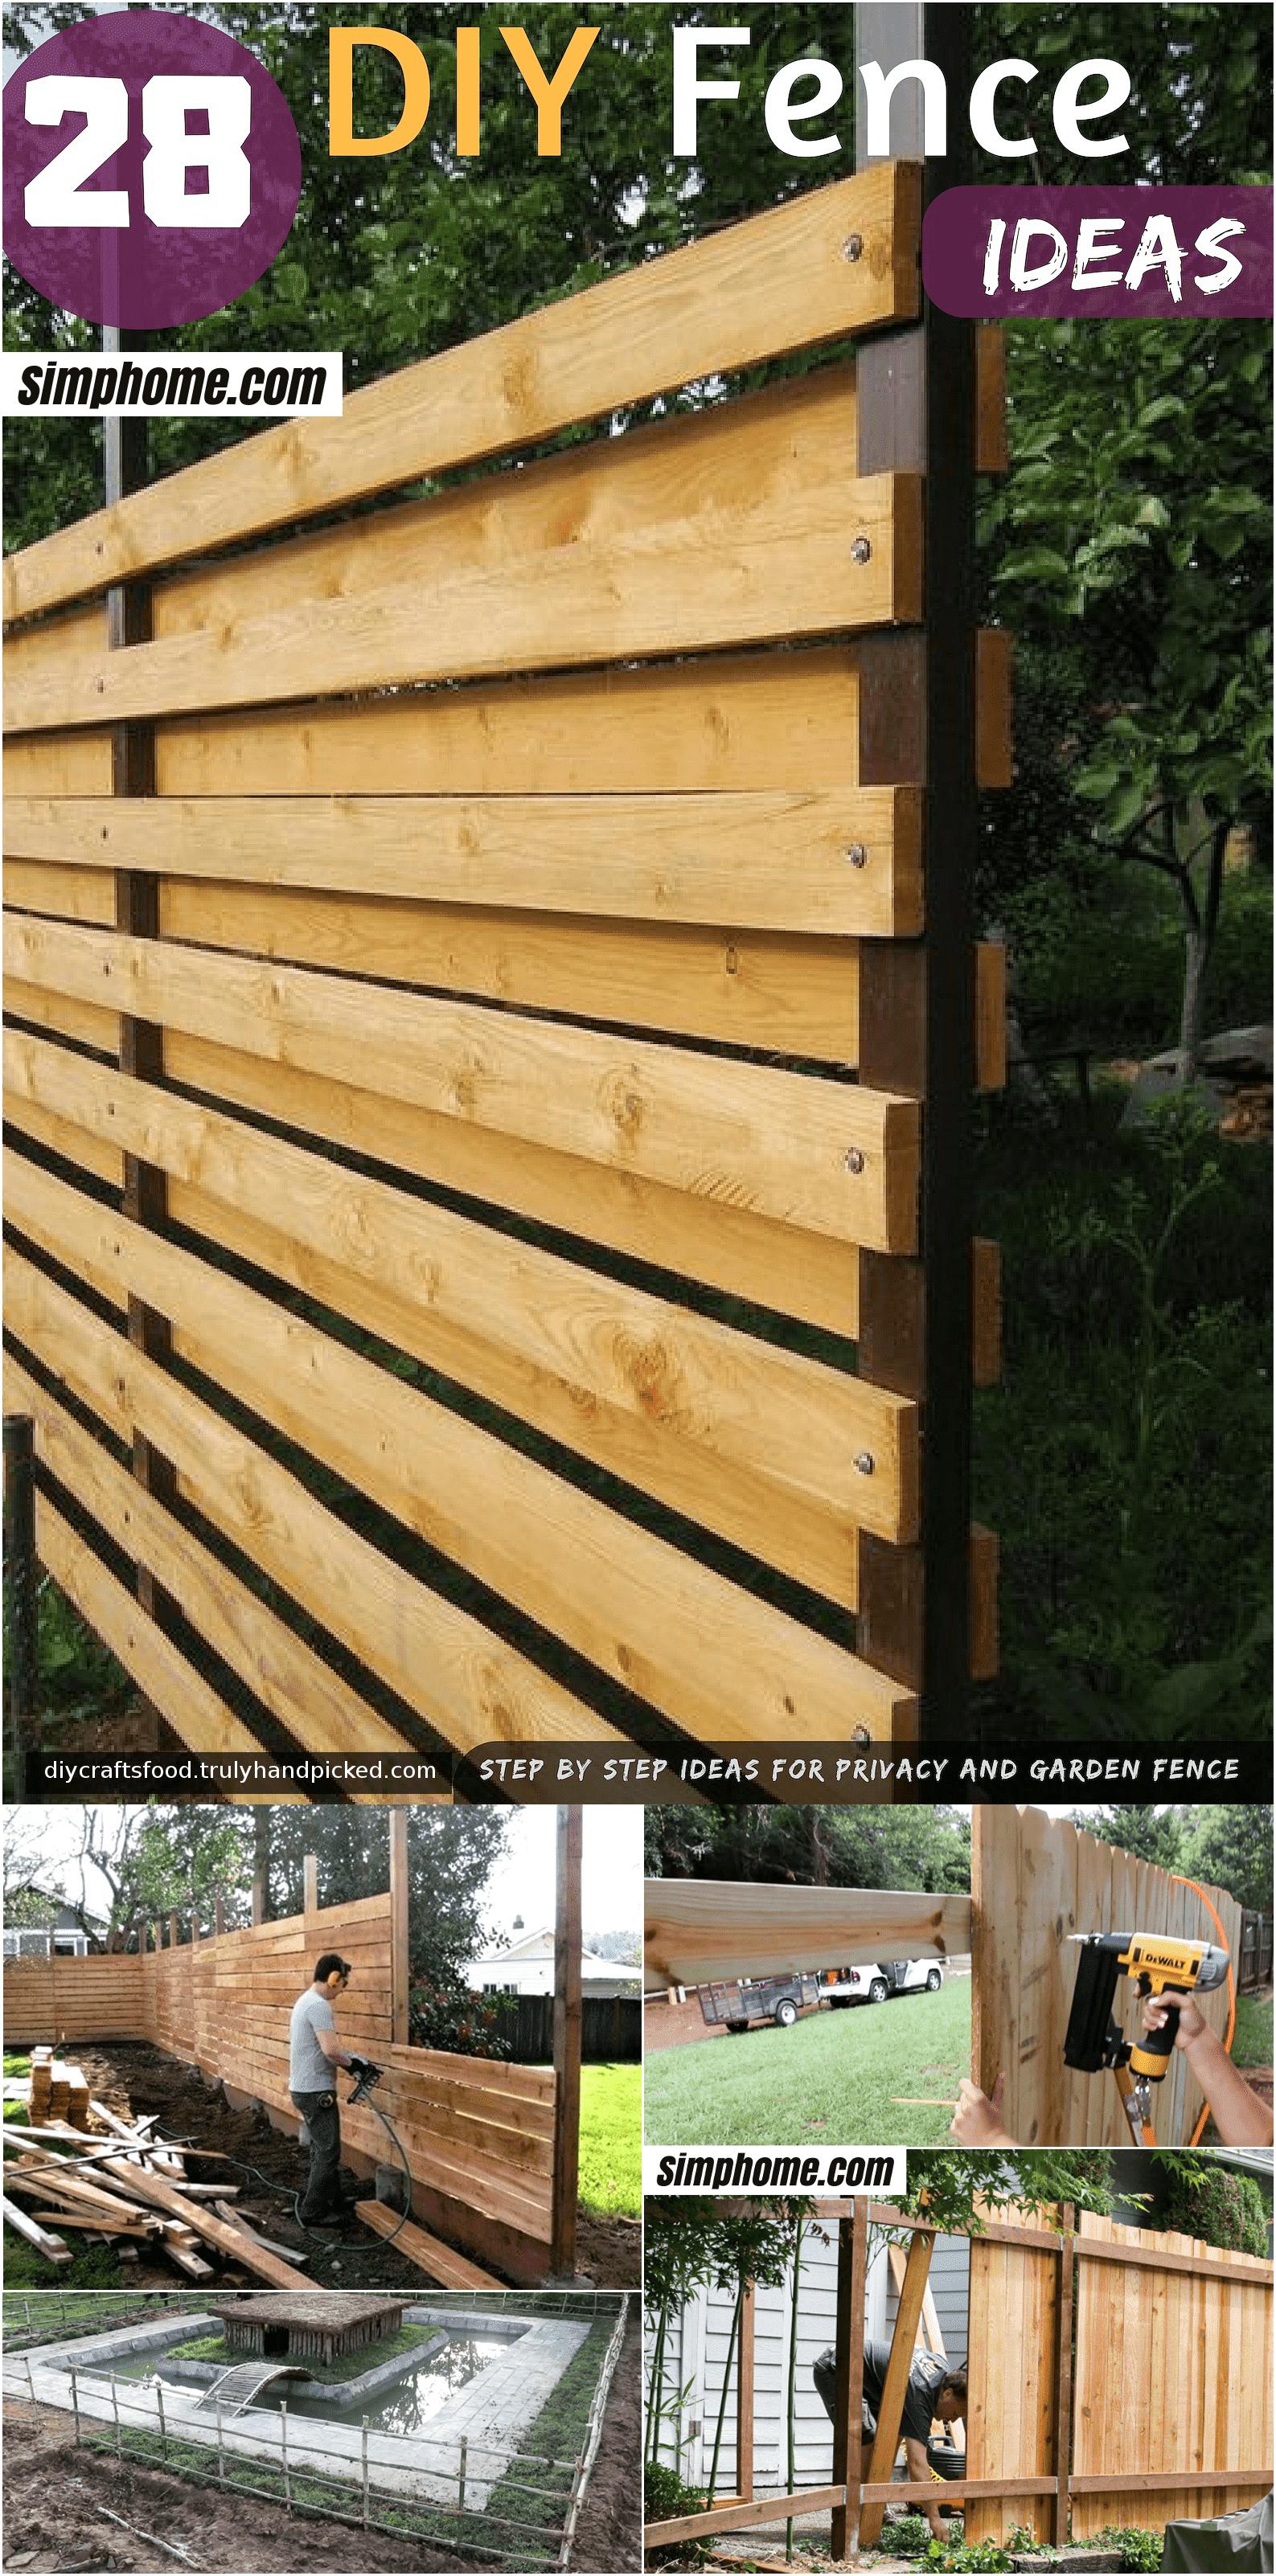 Simphome.com cheap fence ideas for outdoor for 2020 2021 2022